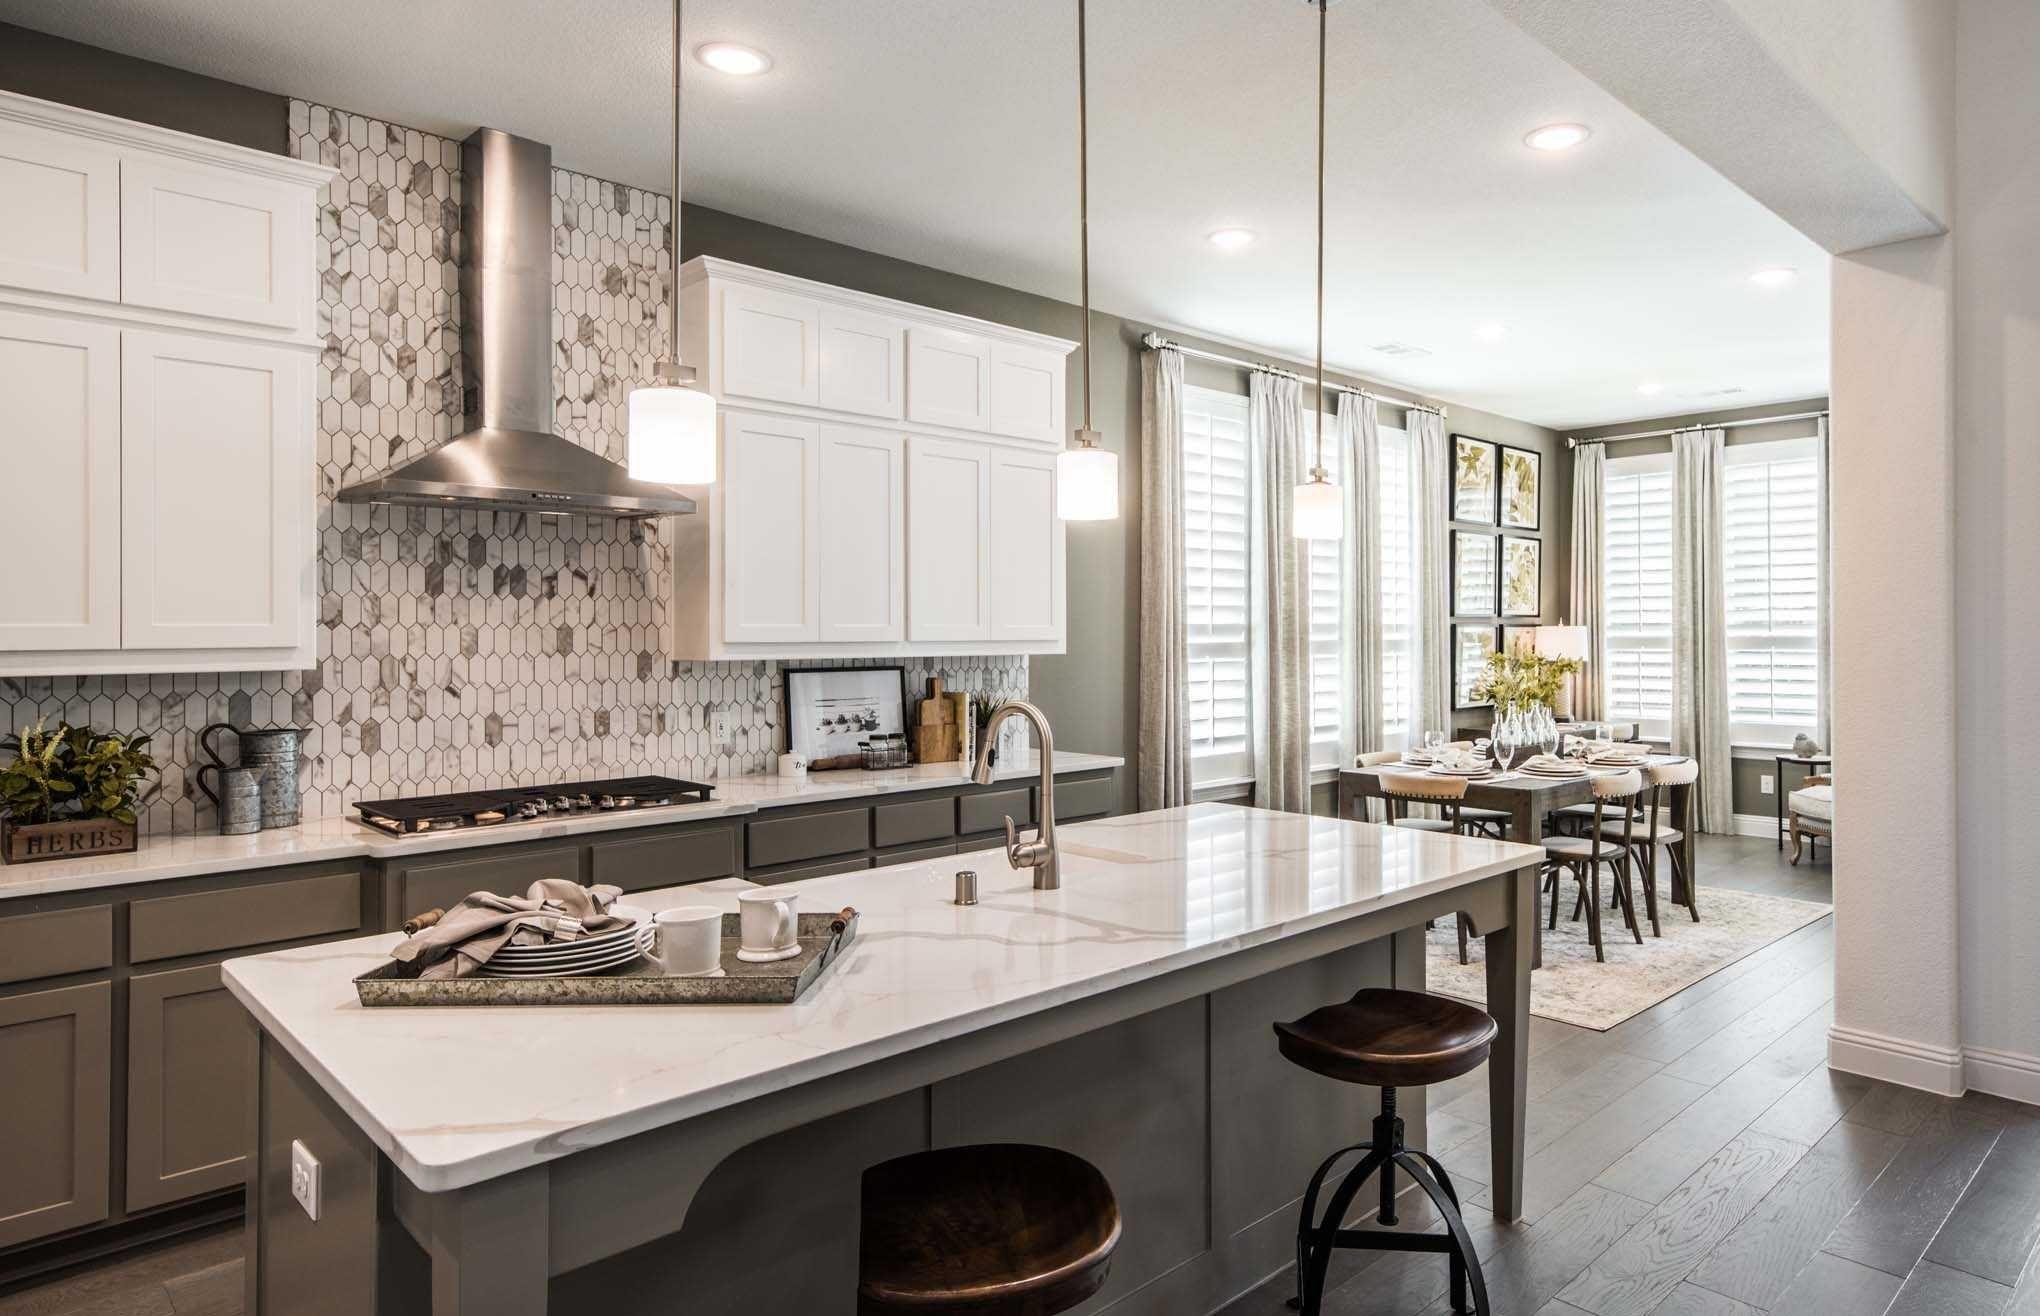 Highland Homes Plan 246 At Fairway Ranch Community In Roanoke Texas Kitchendesign Kitchenideas New Homes Highland Homes Home